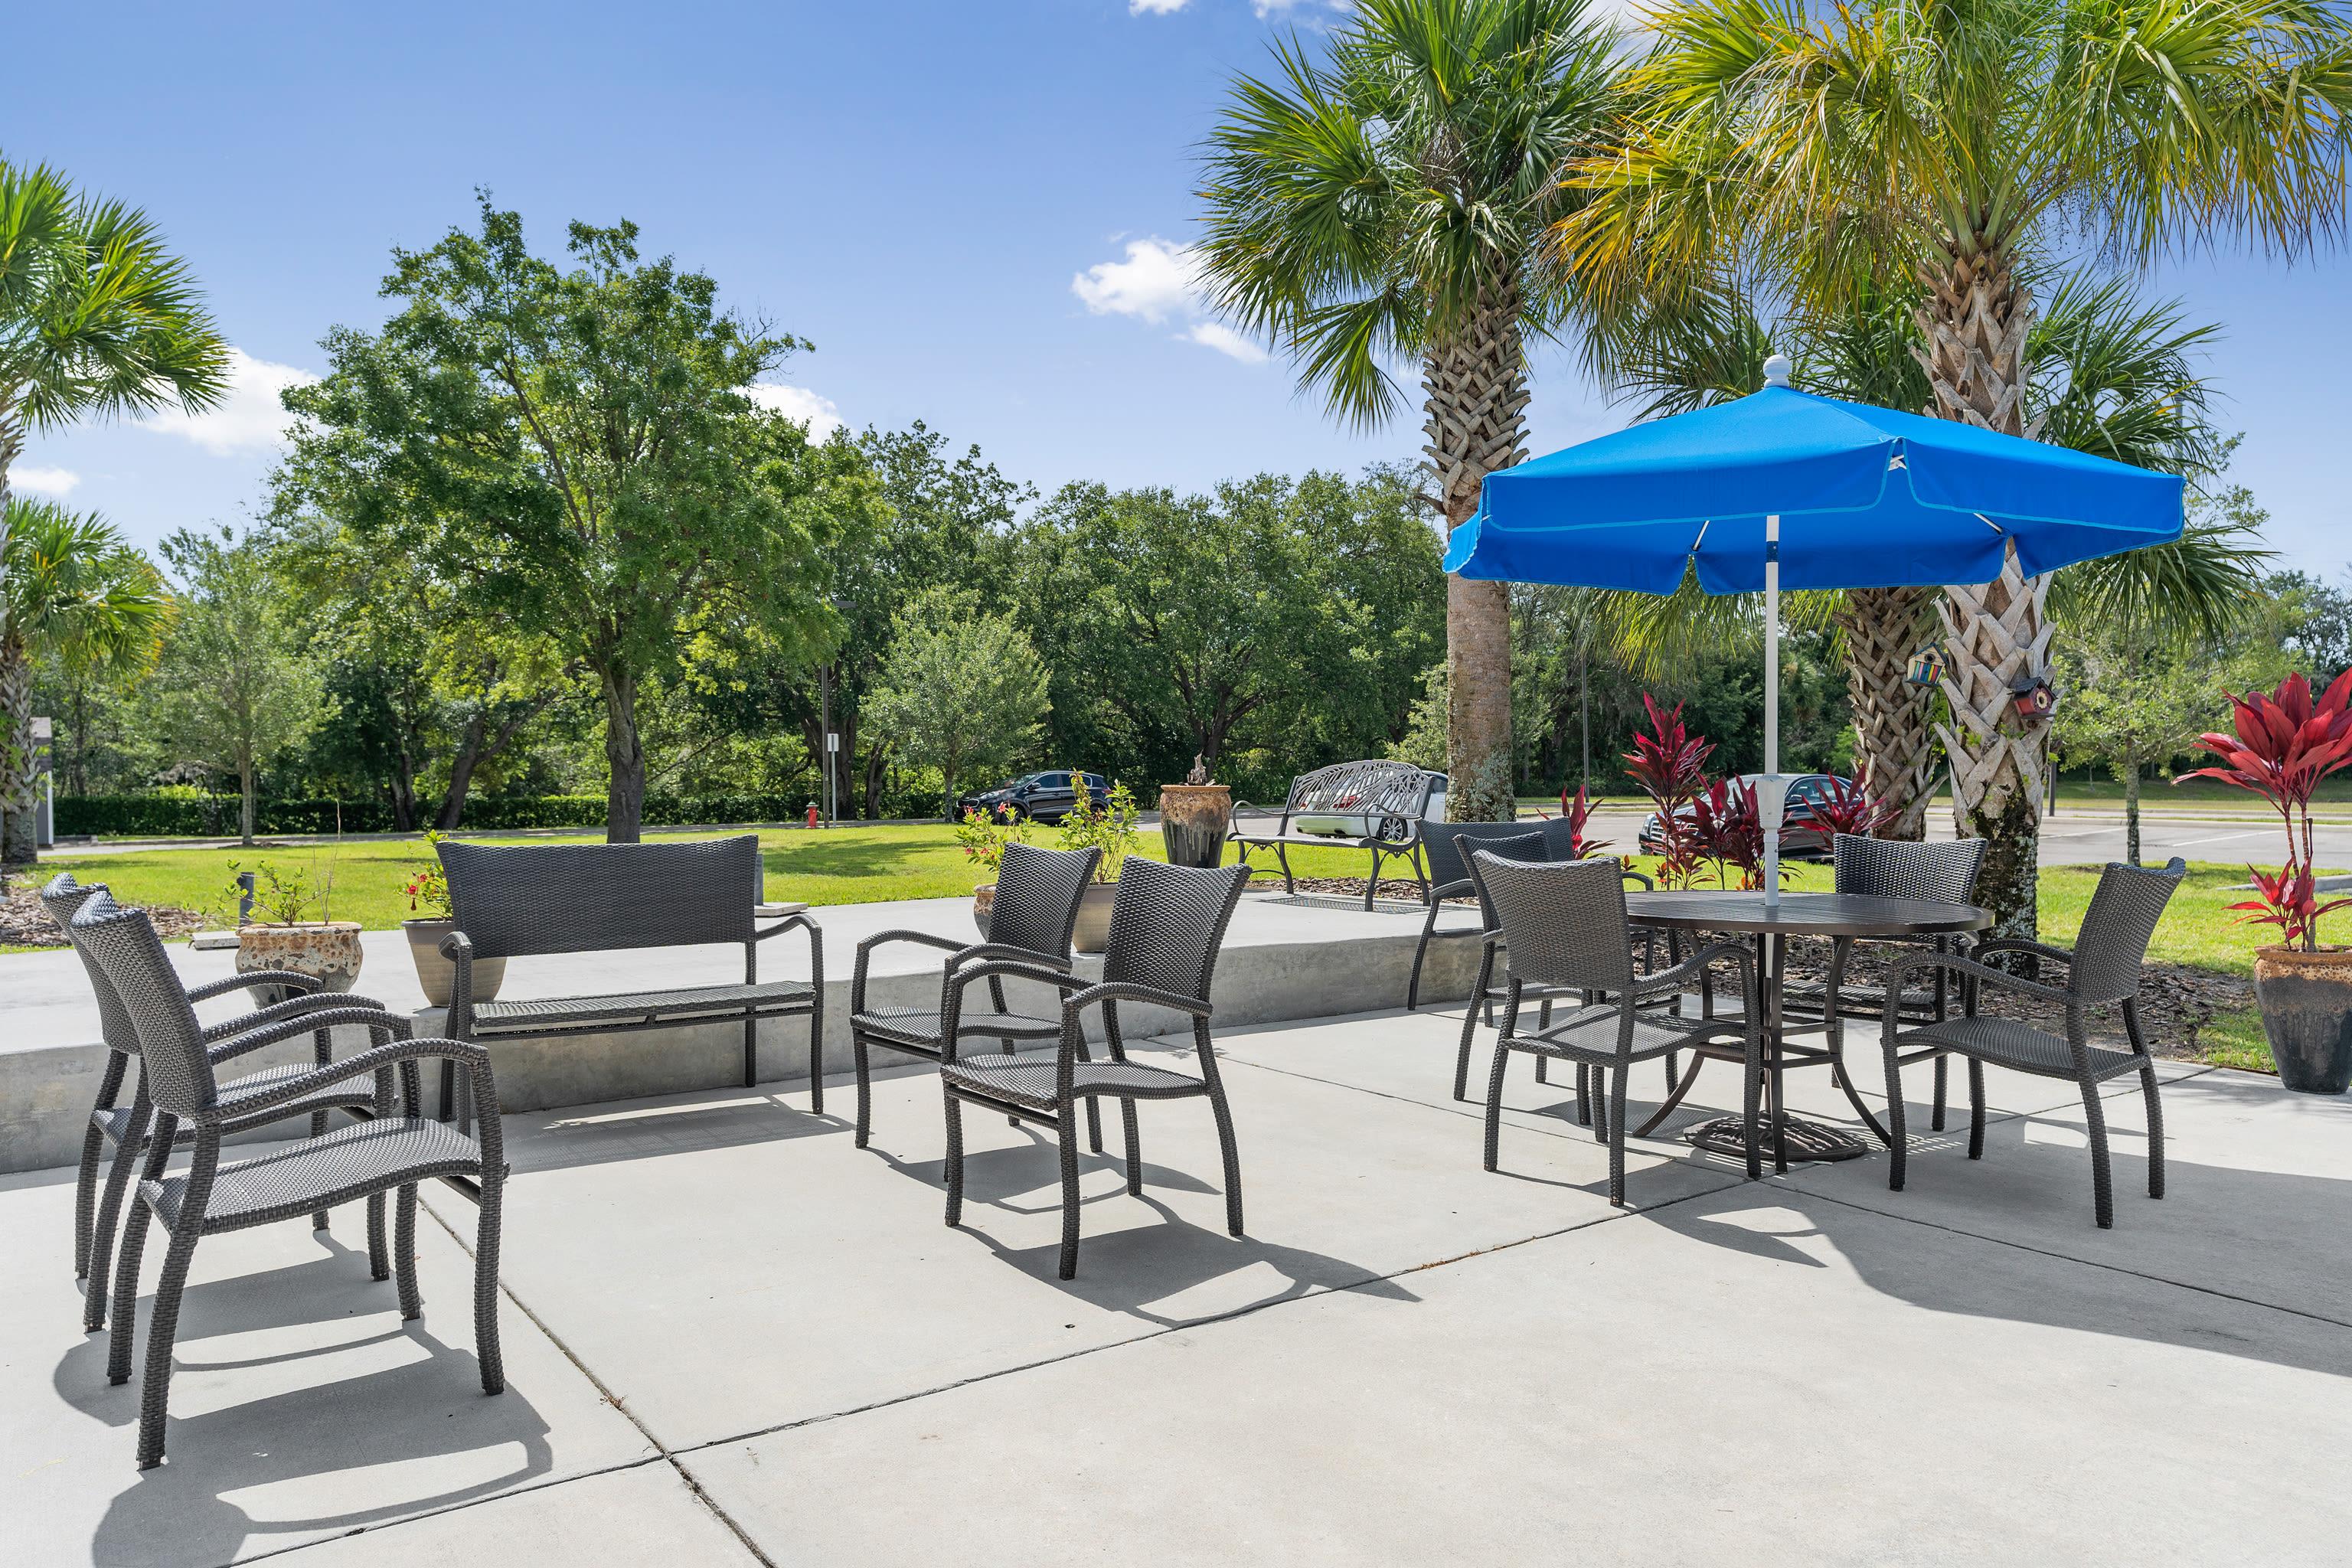 BBQ area at Gentry Park Orlando in Orlando, FL